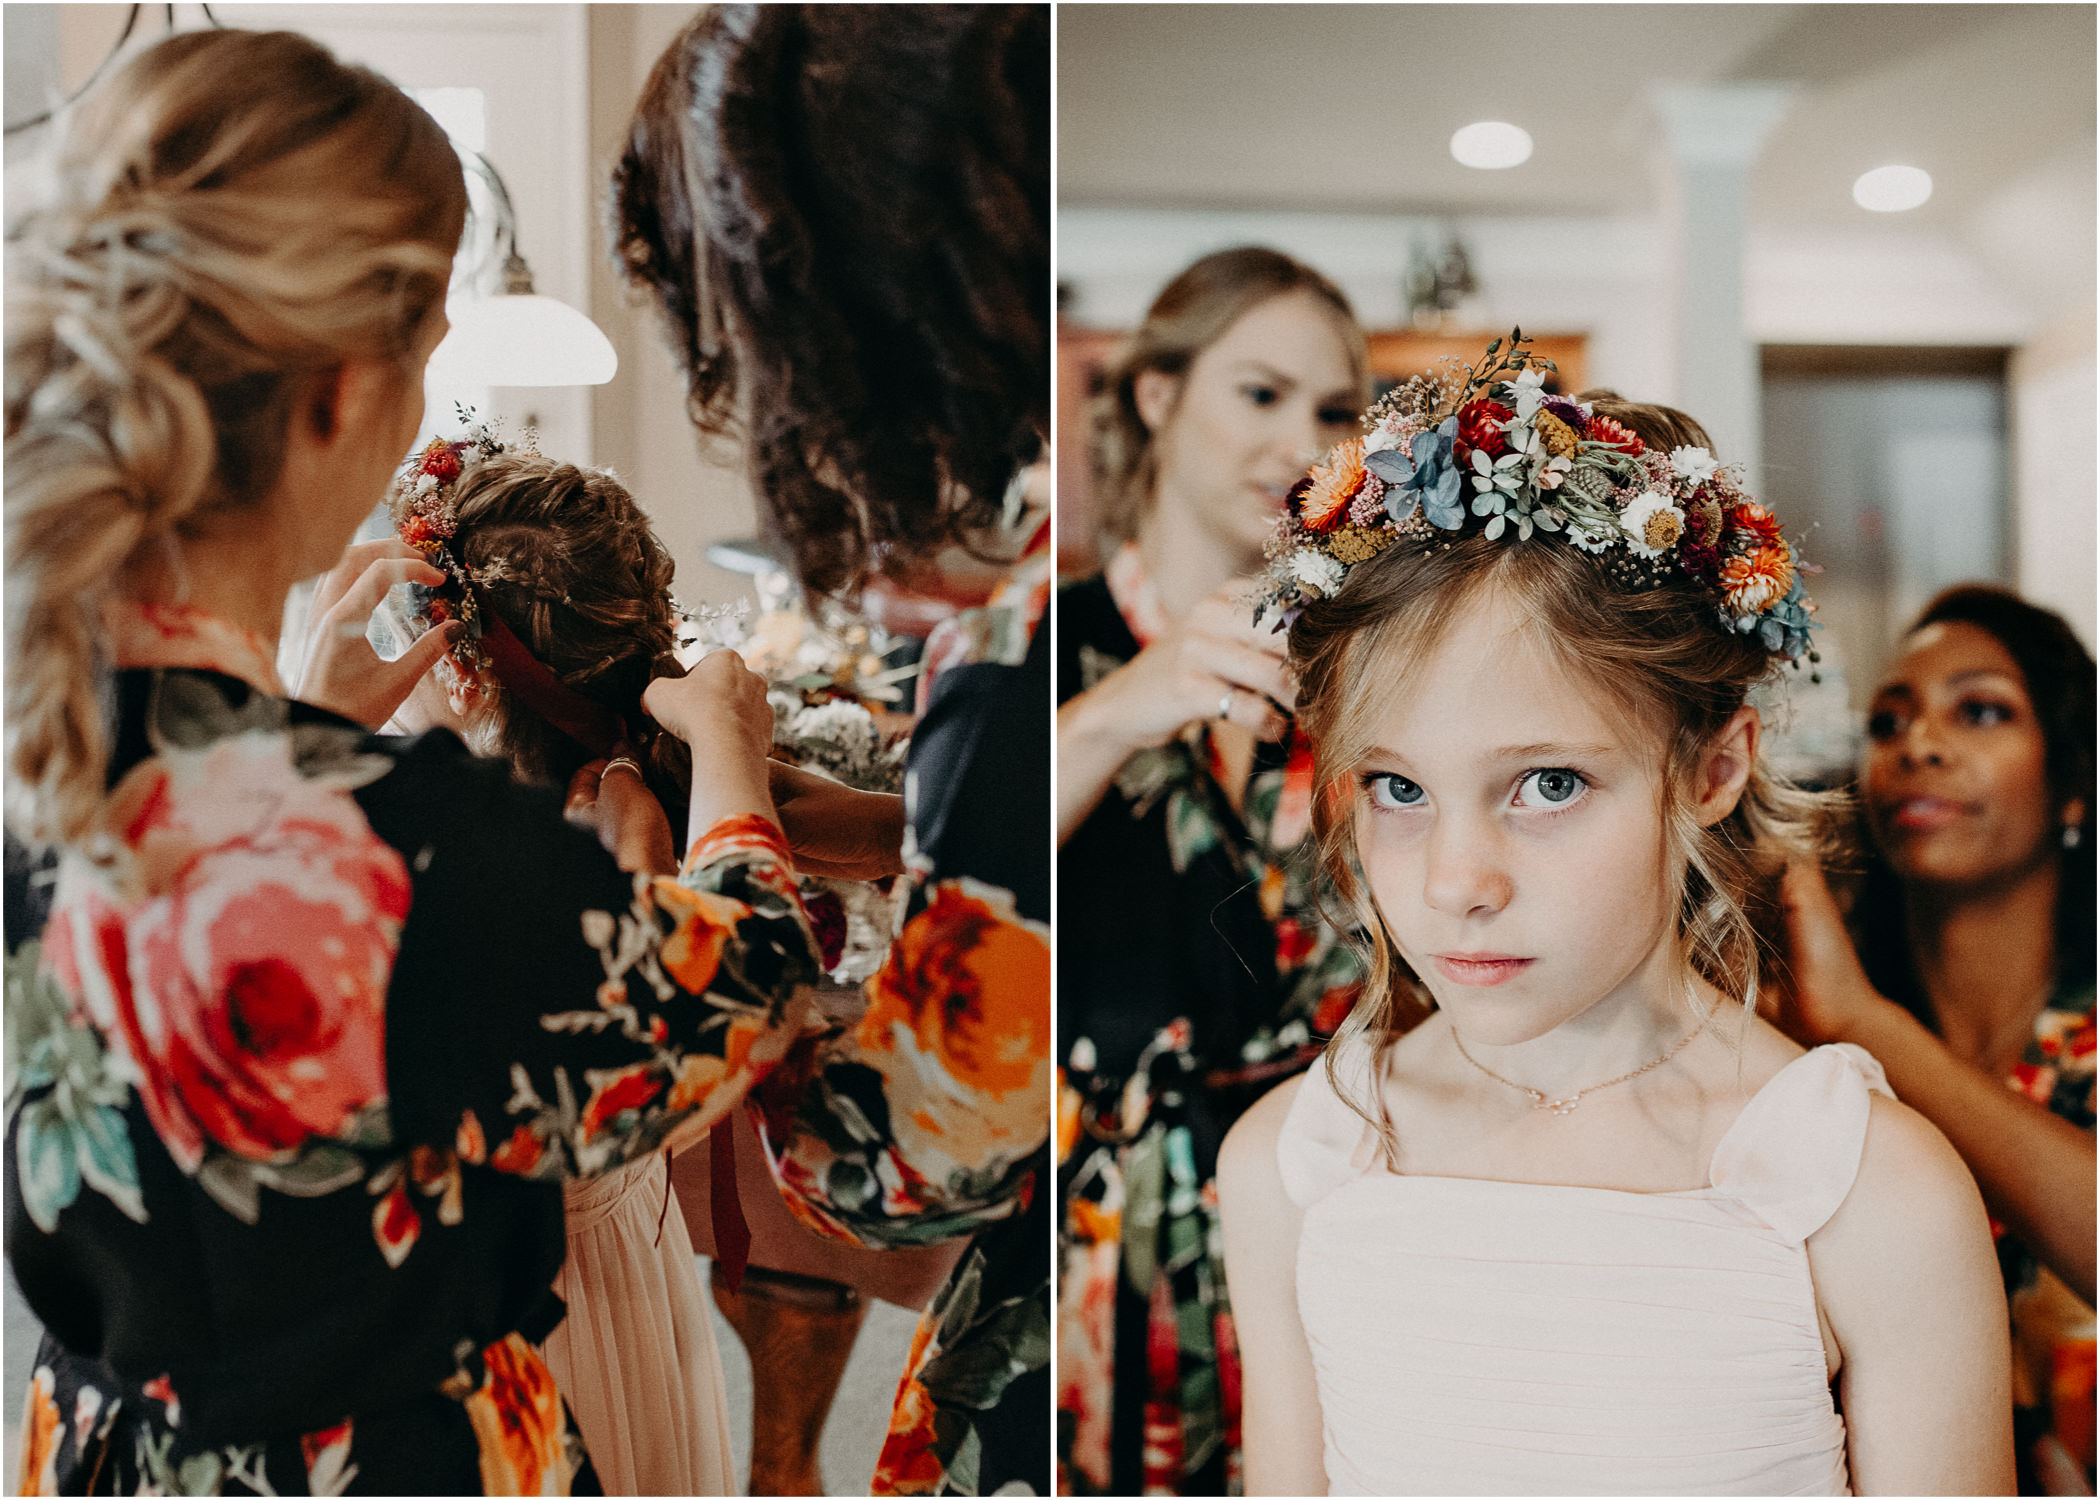 11 Junior Bridesmaid and bride getting ready pictures, Atlanta-Ga Photographer .jpg